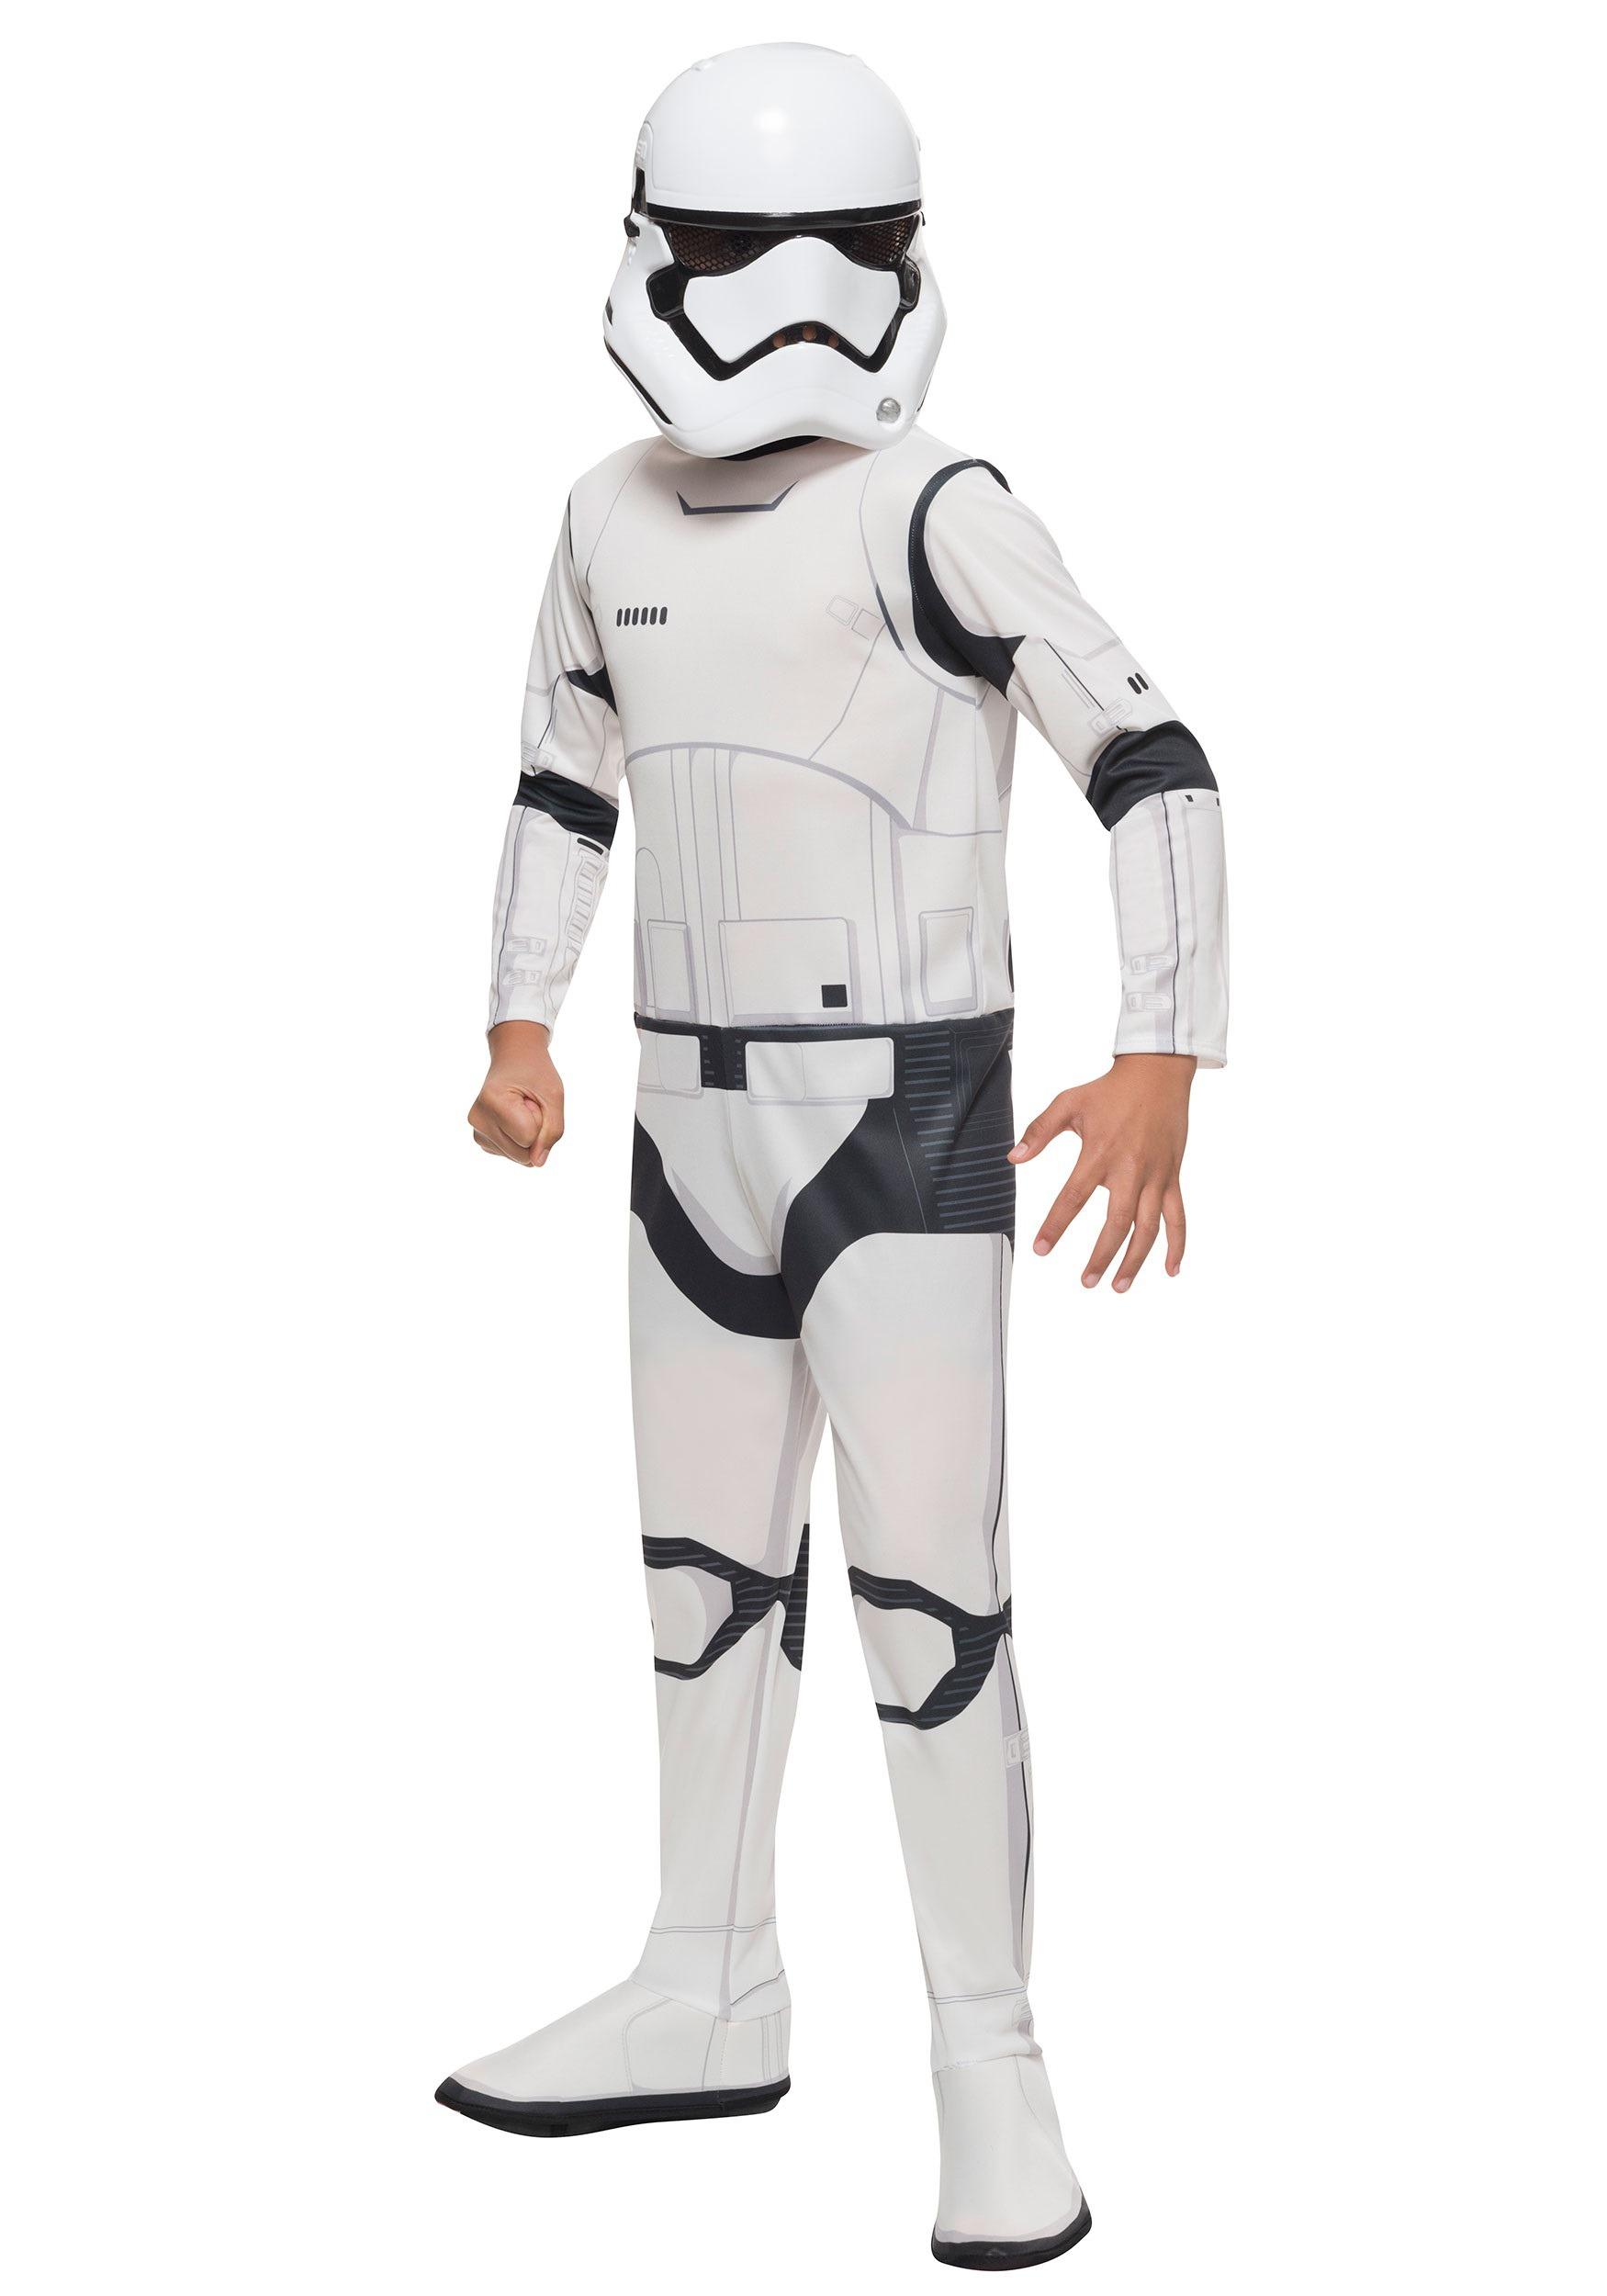 Stormtrooper Costumes & Armor - HalloweenCostumes.com